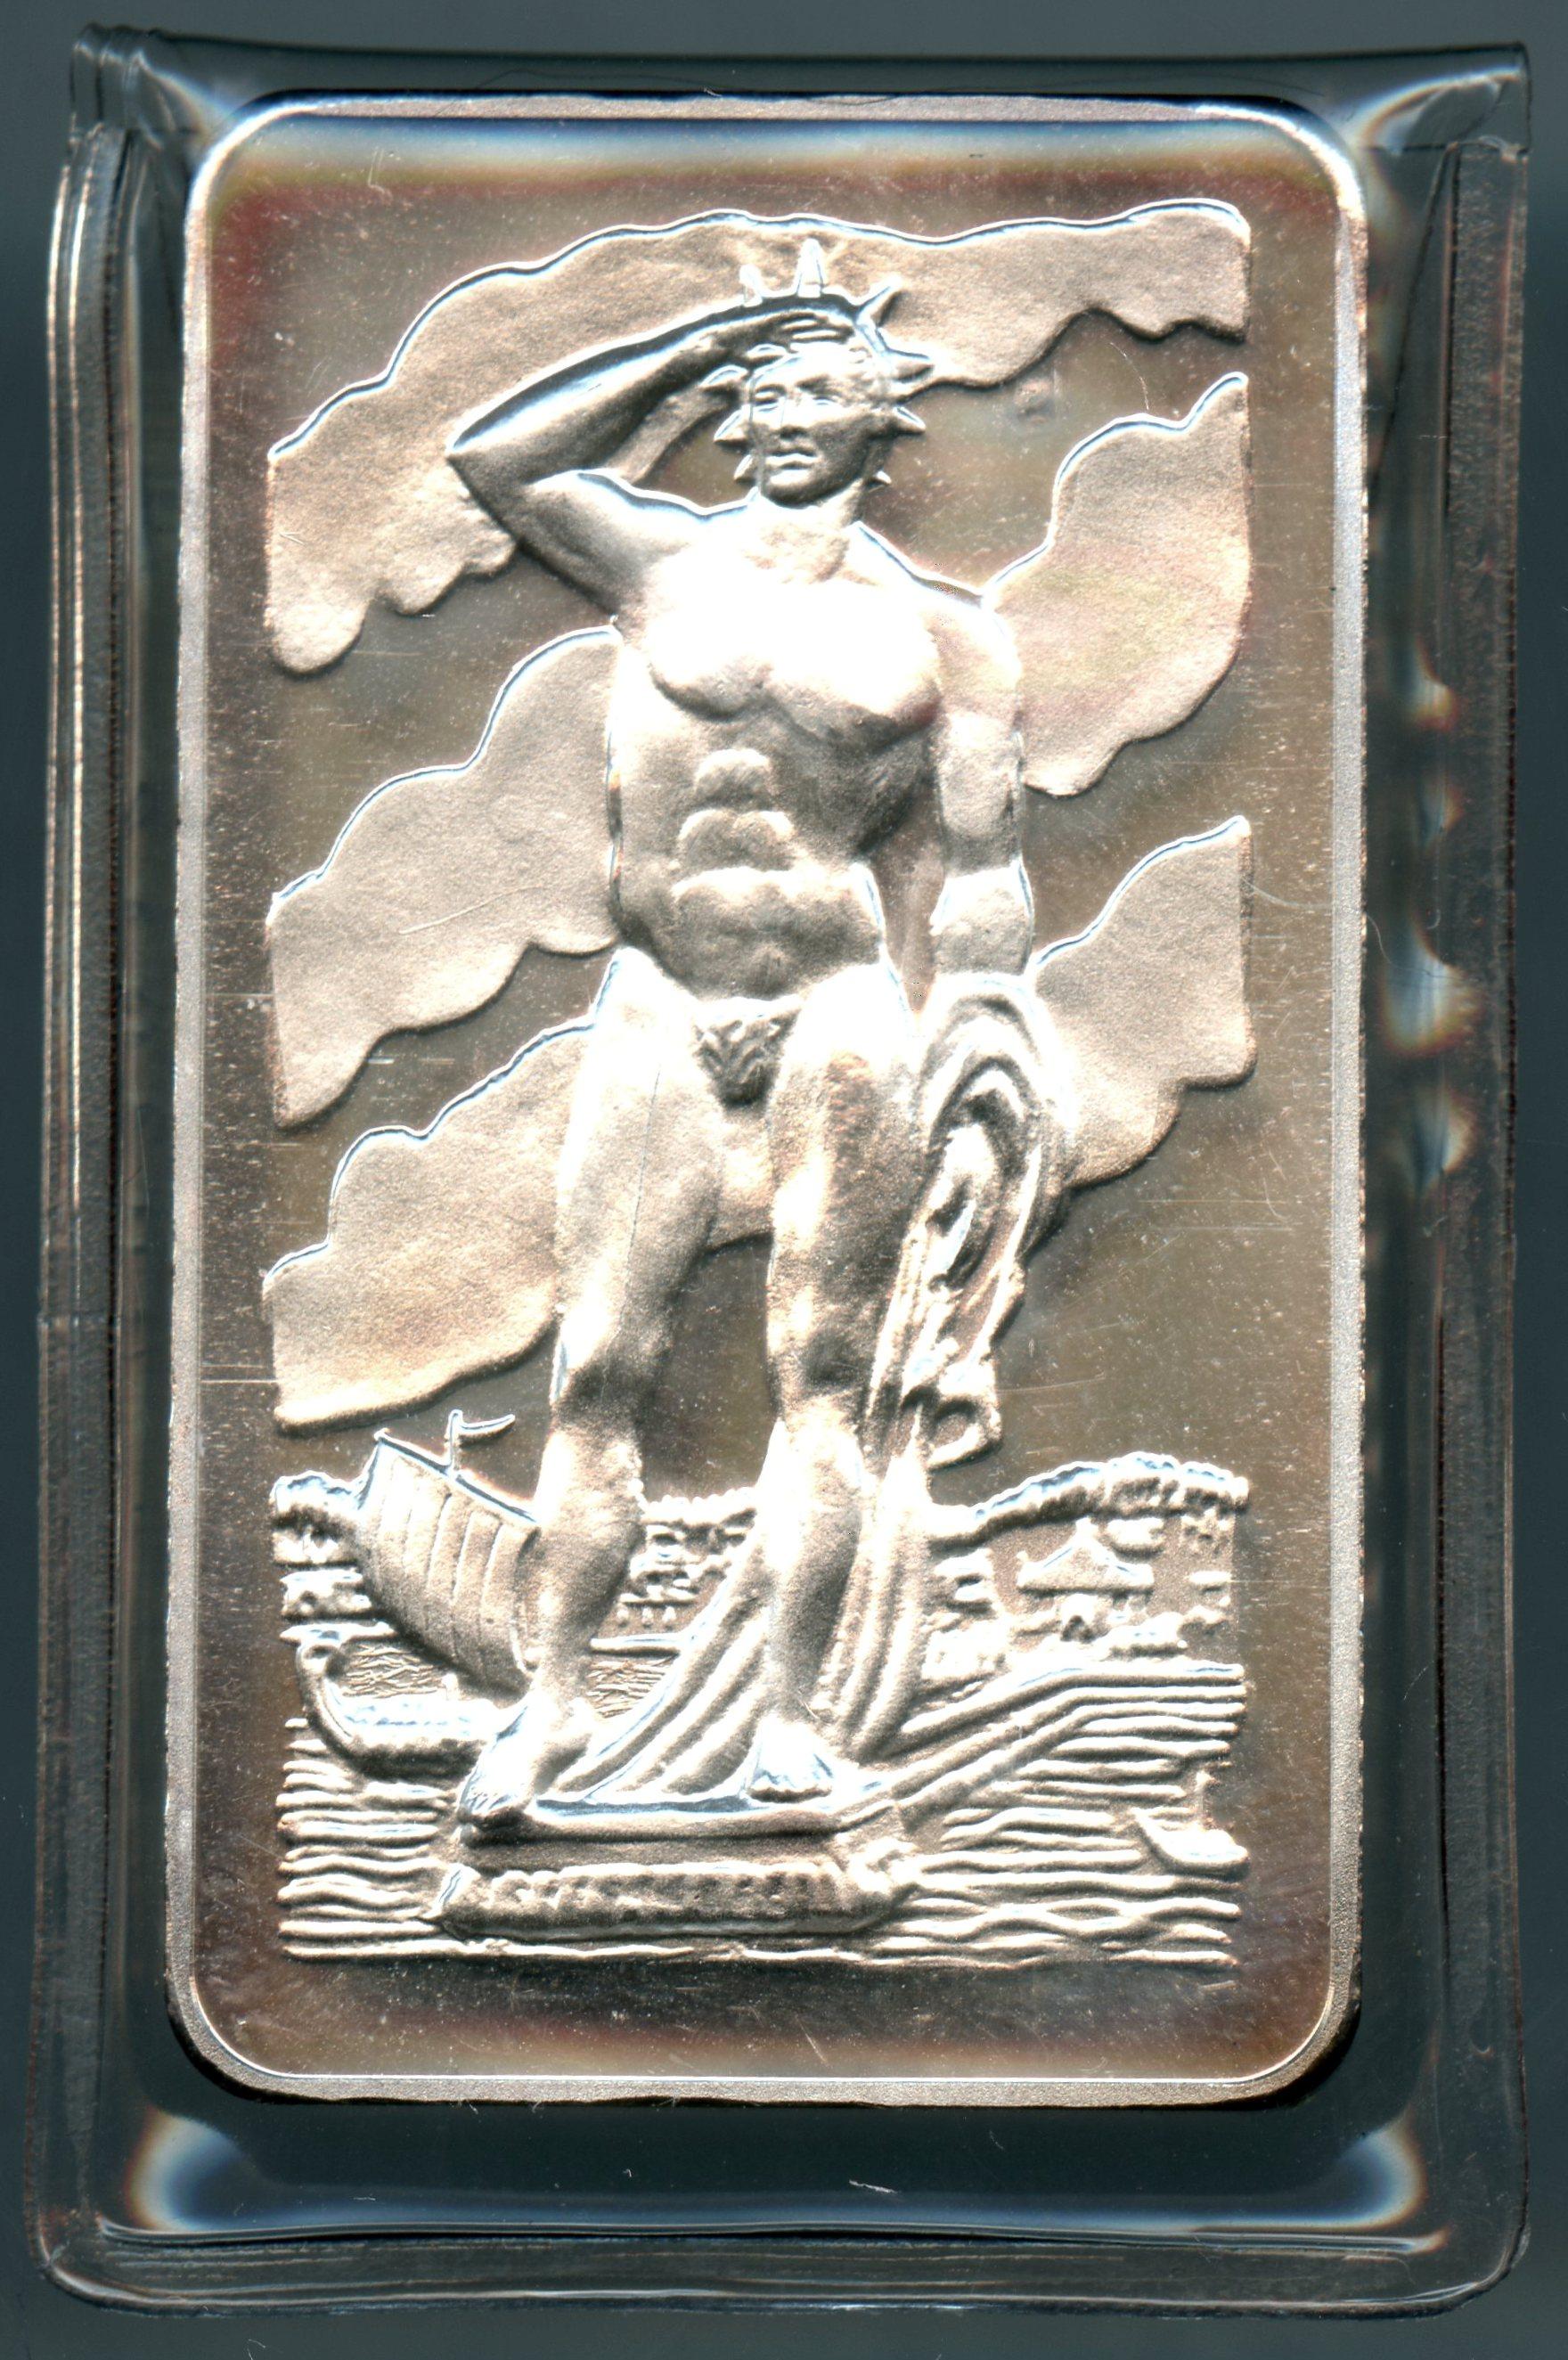 Colossus of Rhodes Mount Everest Mint 1 oz .999 fine silver art bar